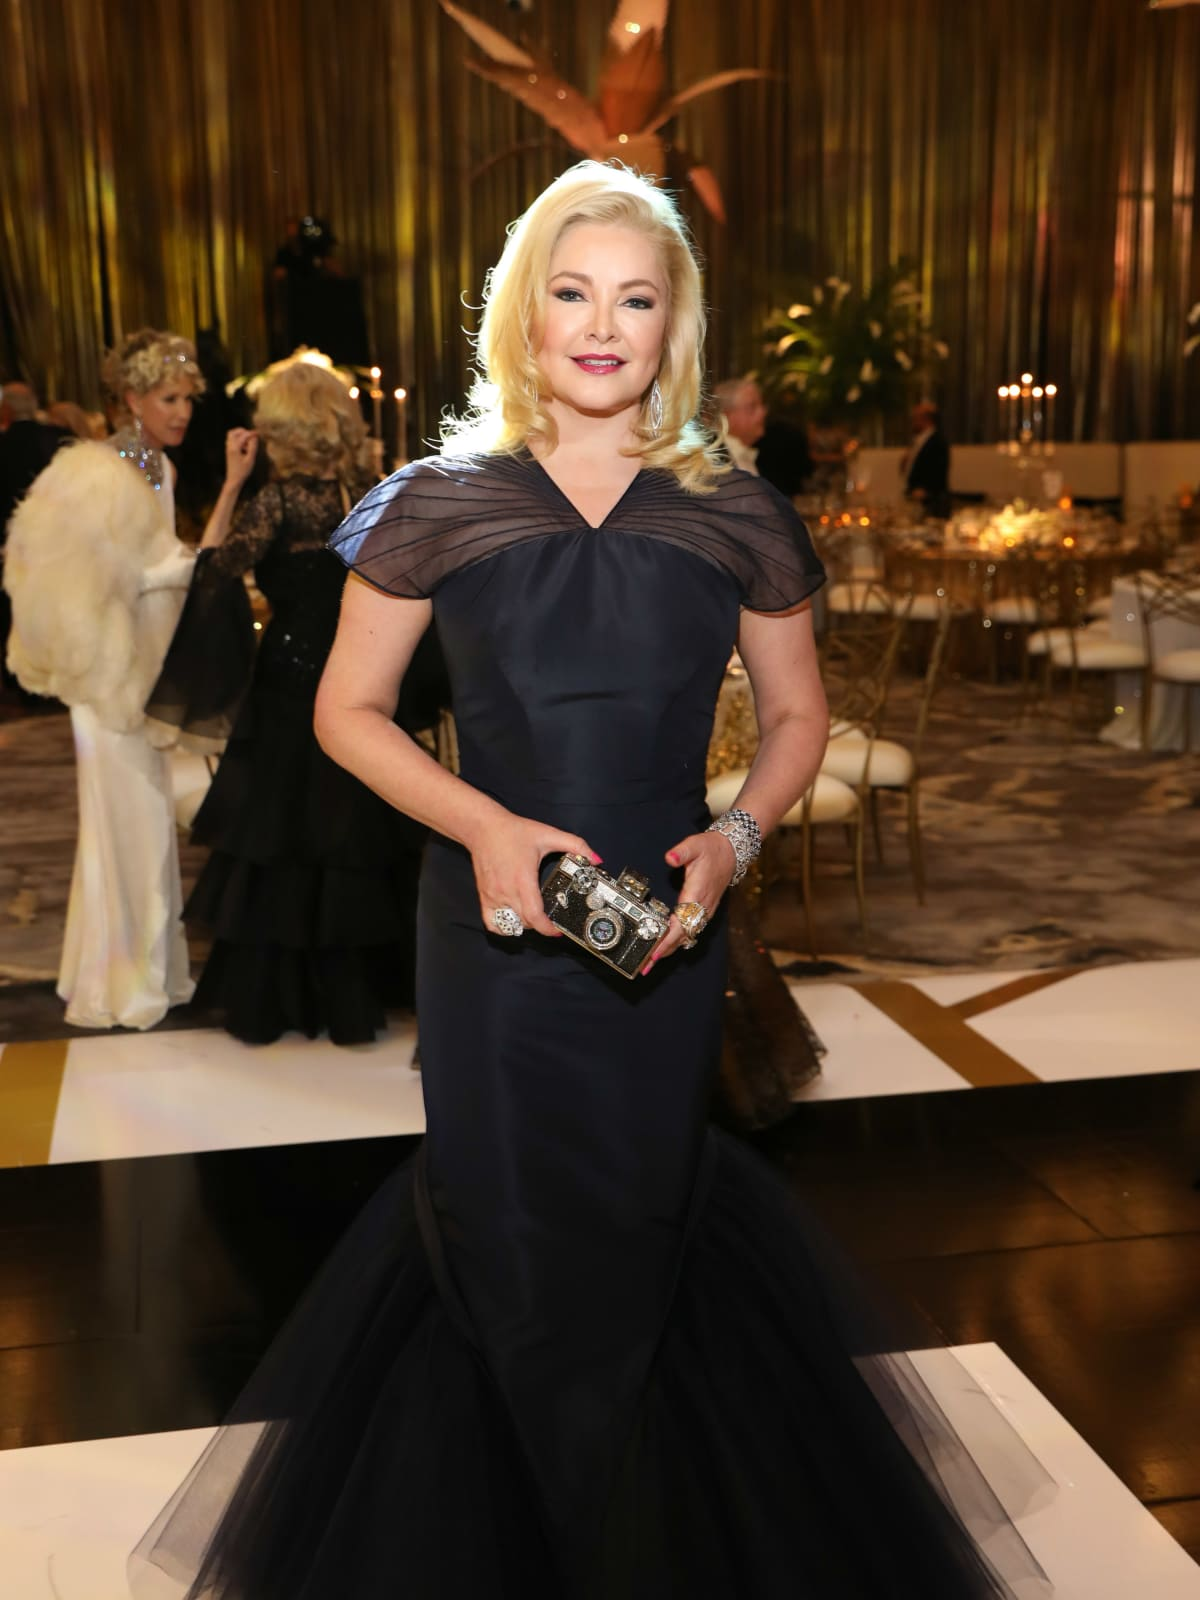 Opera Ball gowns Whitney Crane in Zac Posen